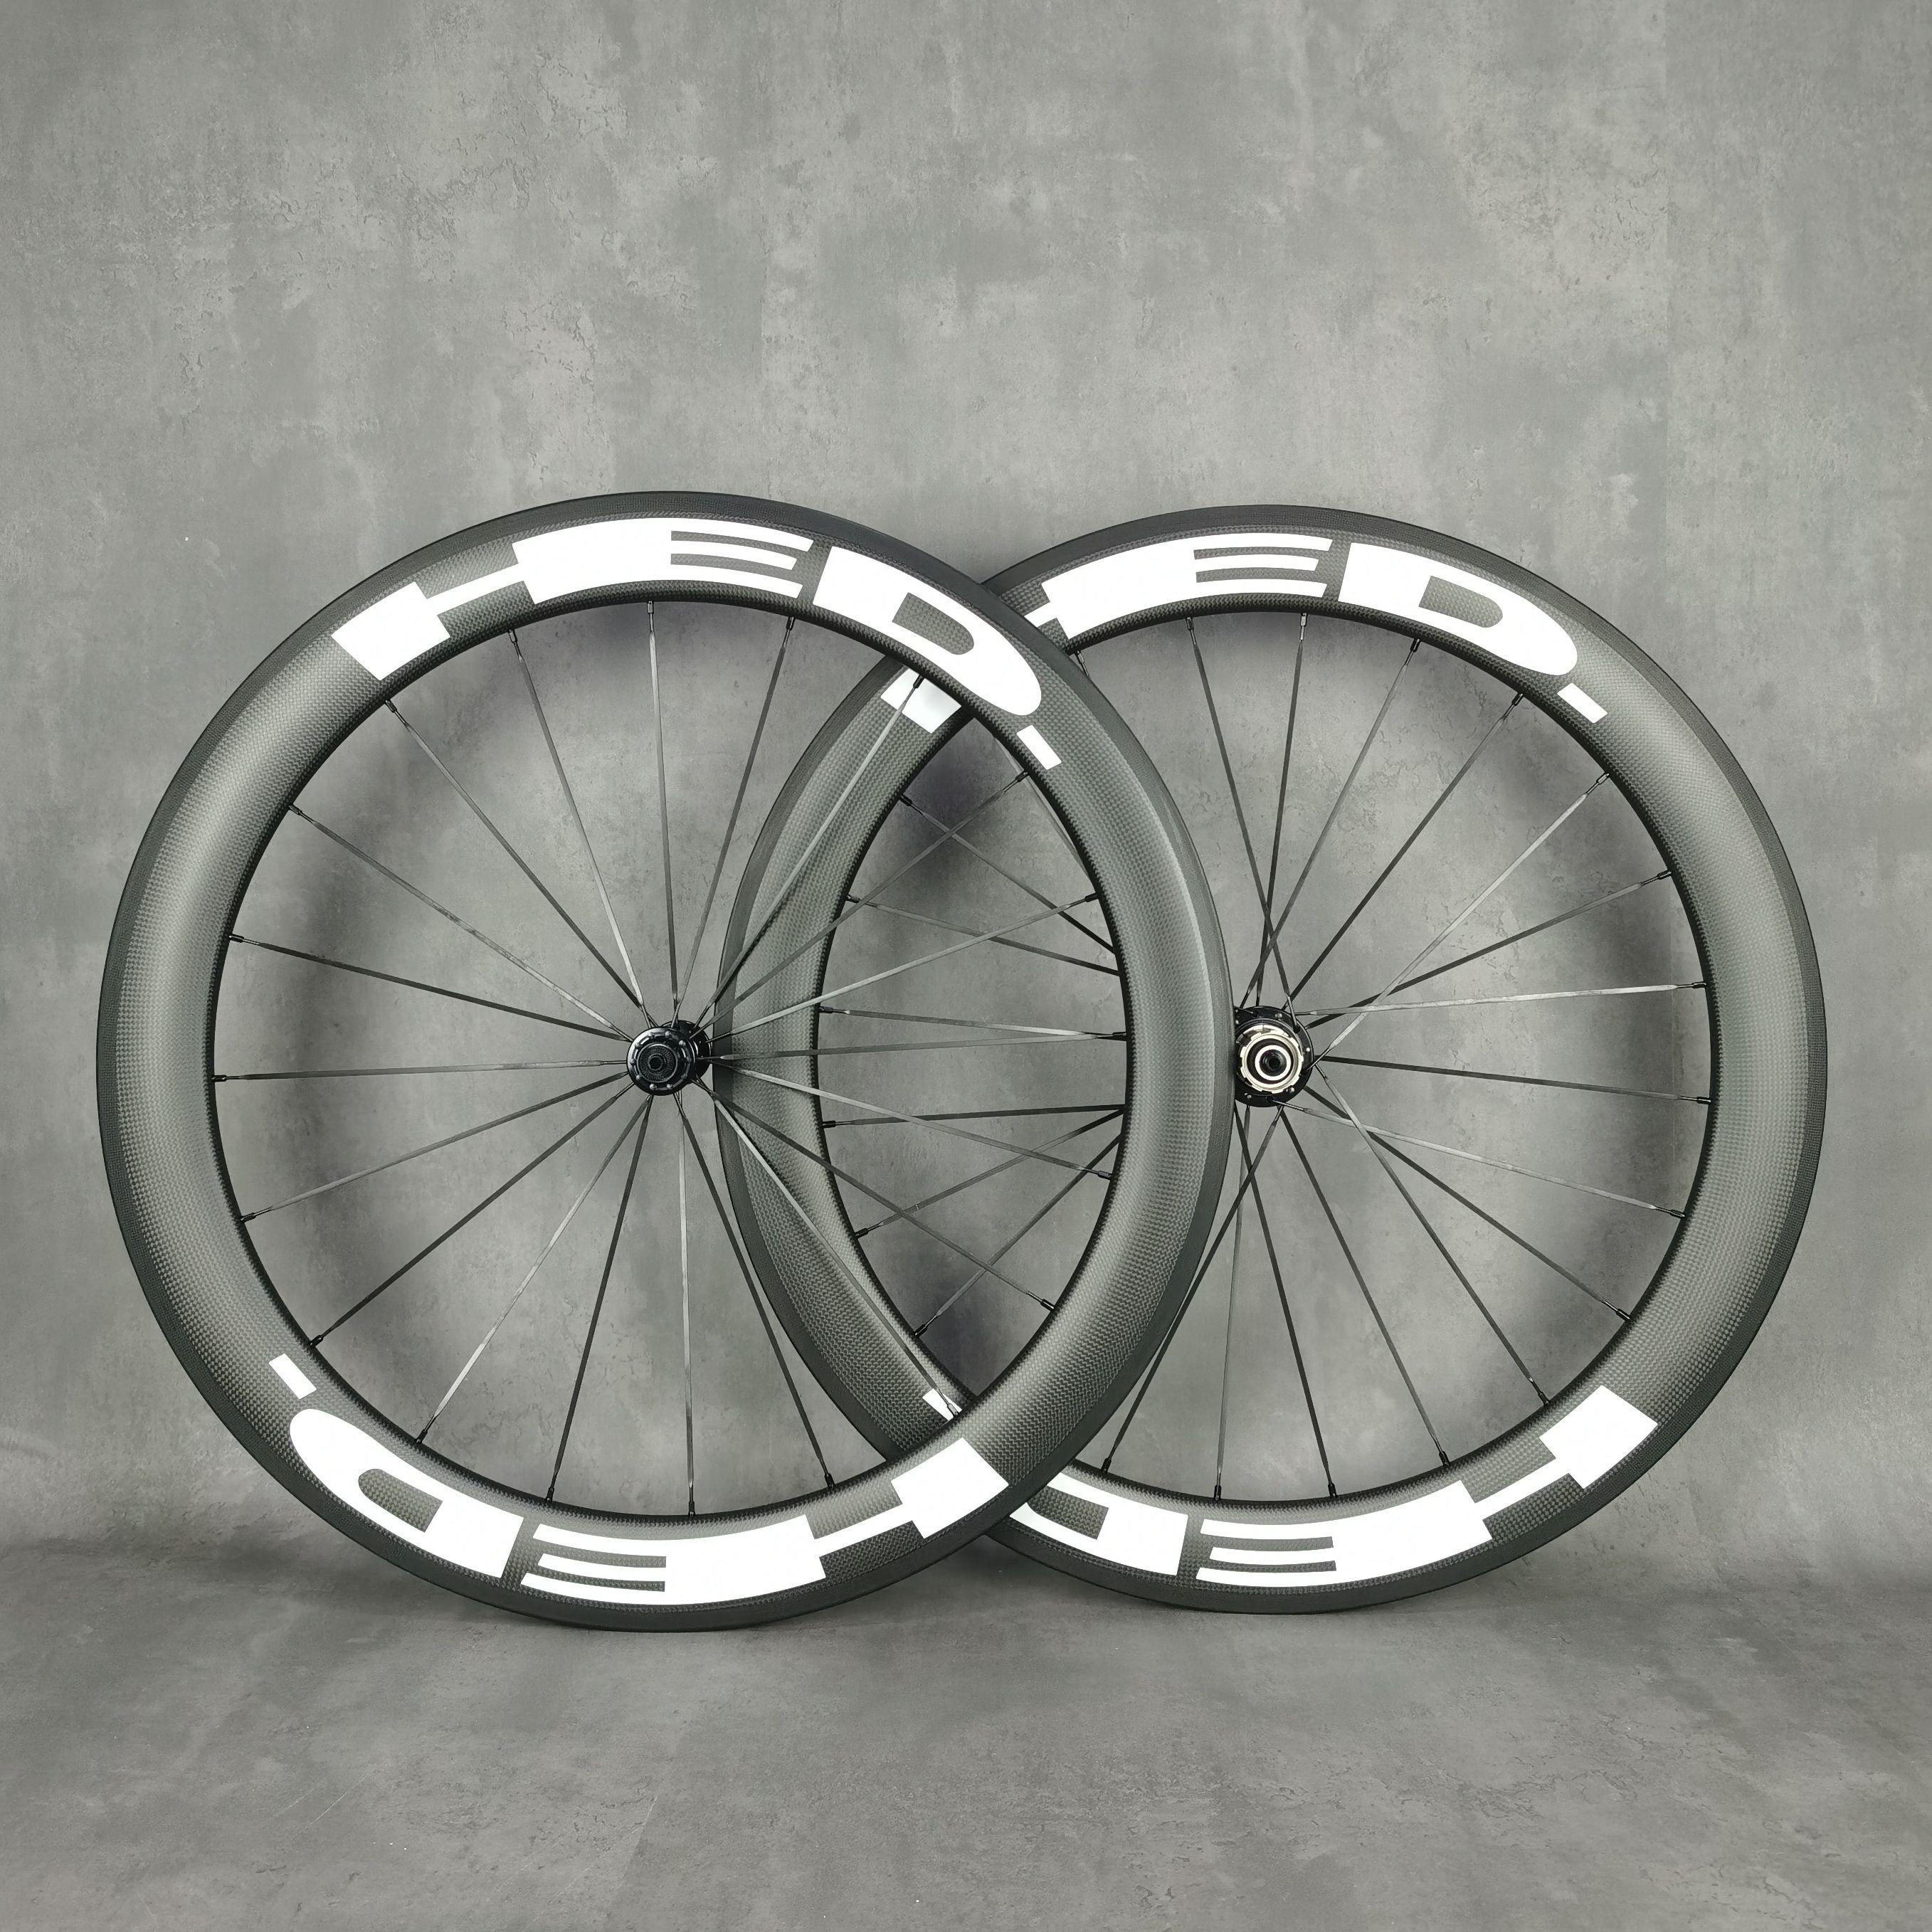 HED 700C الطريق دراجة ضوء عجلات الكربون 60MM عمق 25MM عرض الفاصلة / لايحتاج / أنبوبي دراجة الكربون العجلات مع 3K ماتي النهاية